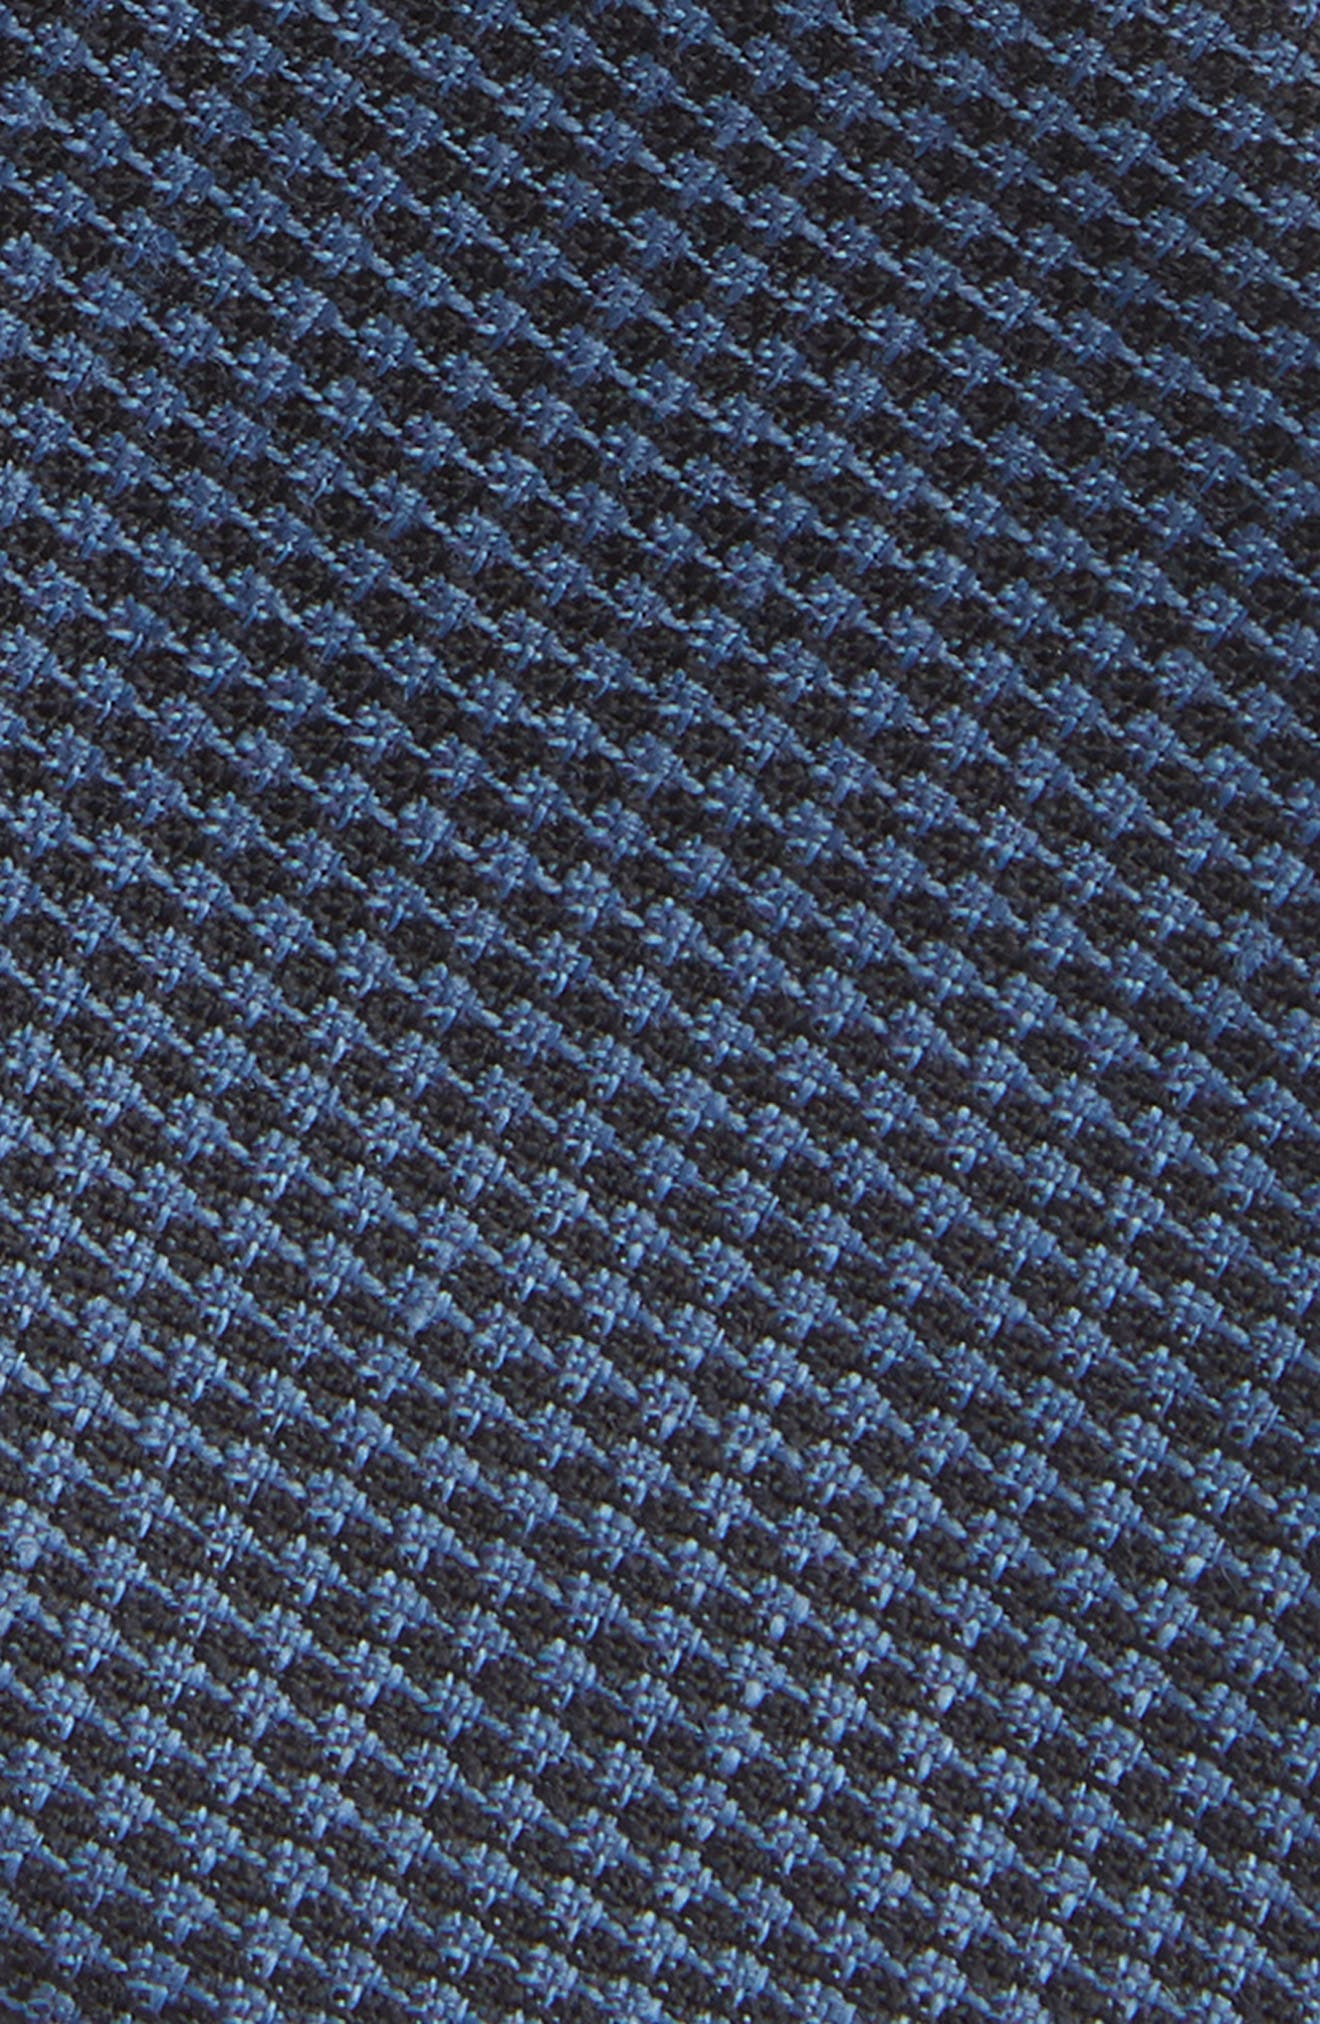 Grid Wool & Linen Tie,                             Alternate thumbnail 2, color,                             LIGHT BLUE